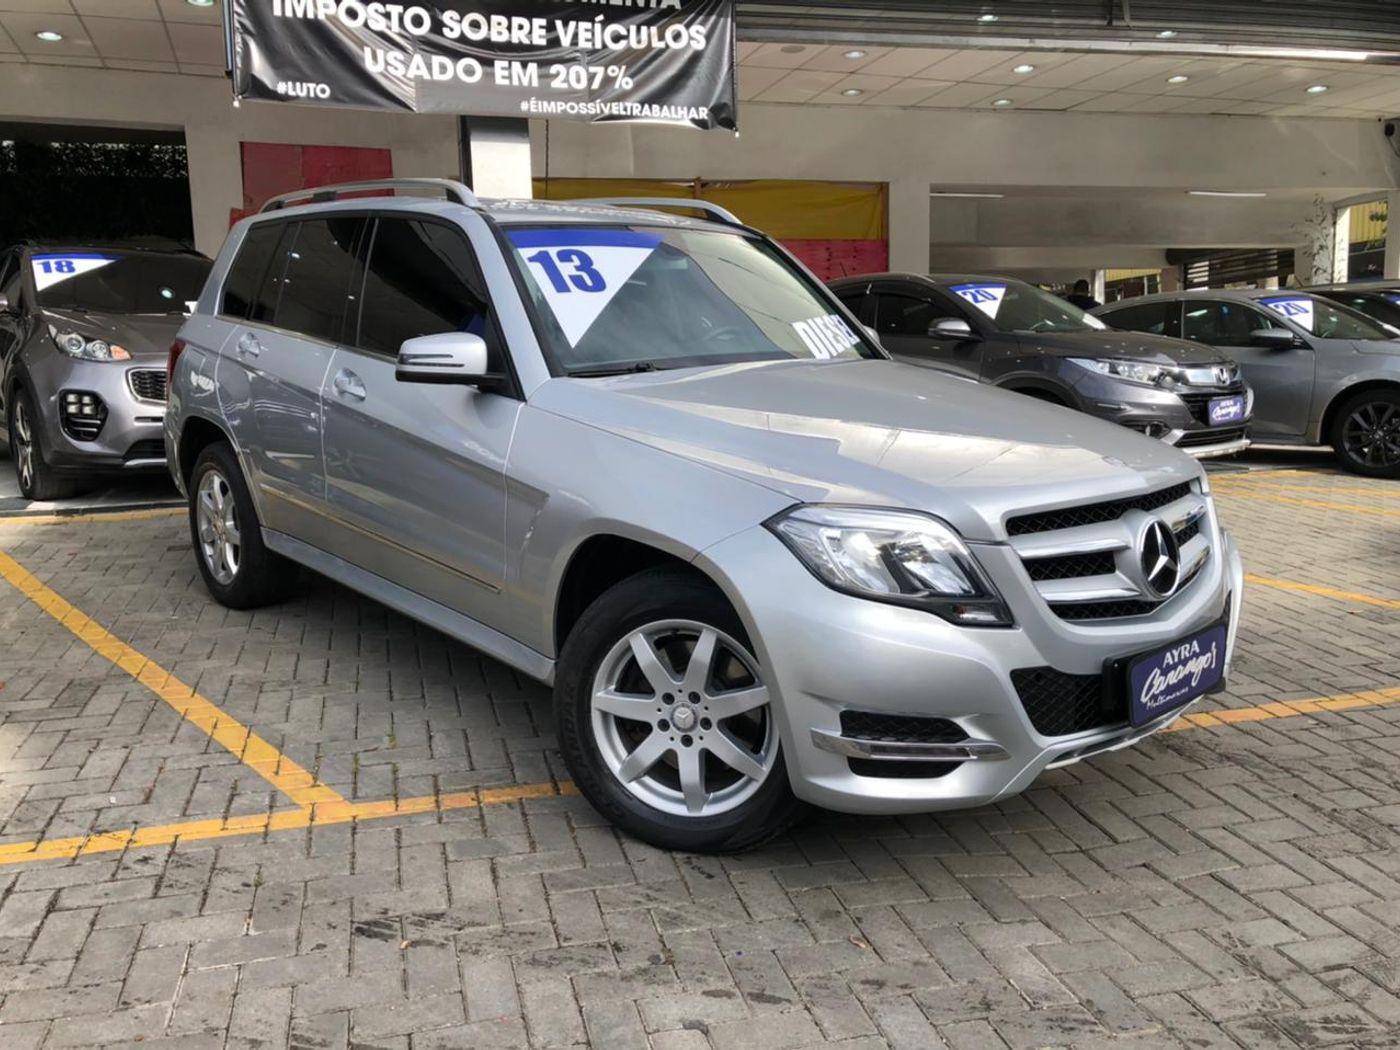 Mercedes GLK 220 CDI 2.2 TB 4X4 170cv Aut. Diesel